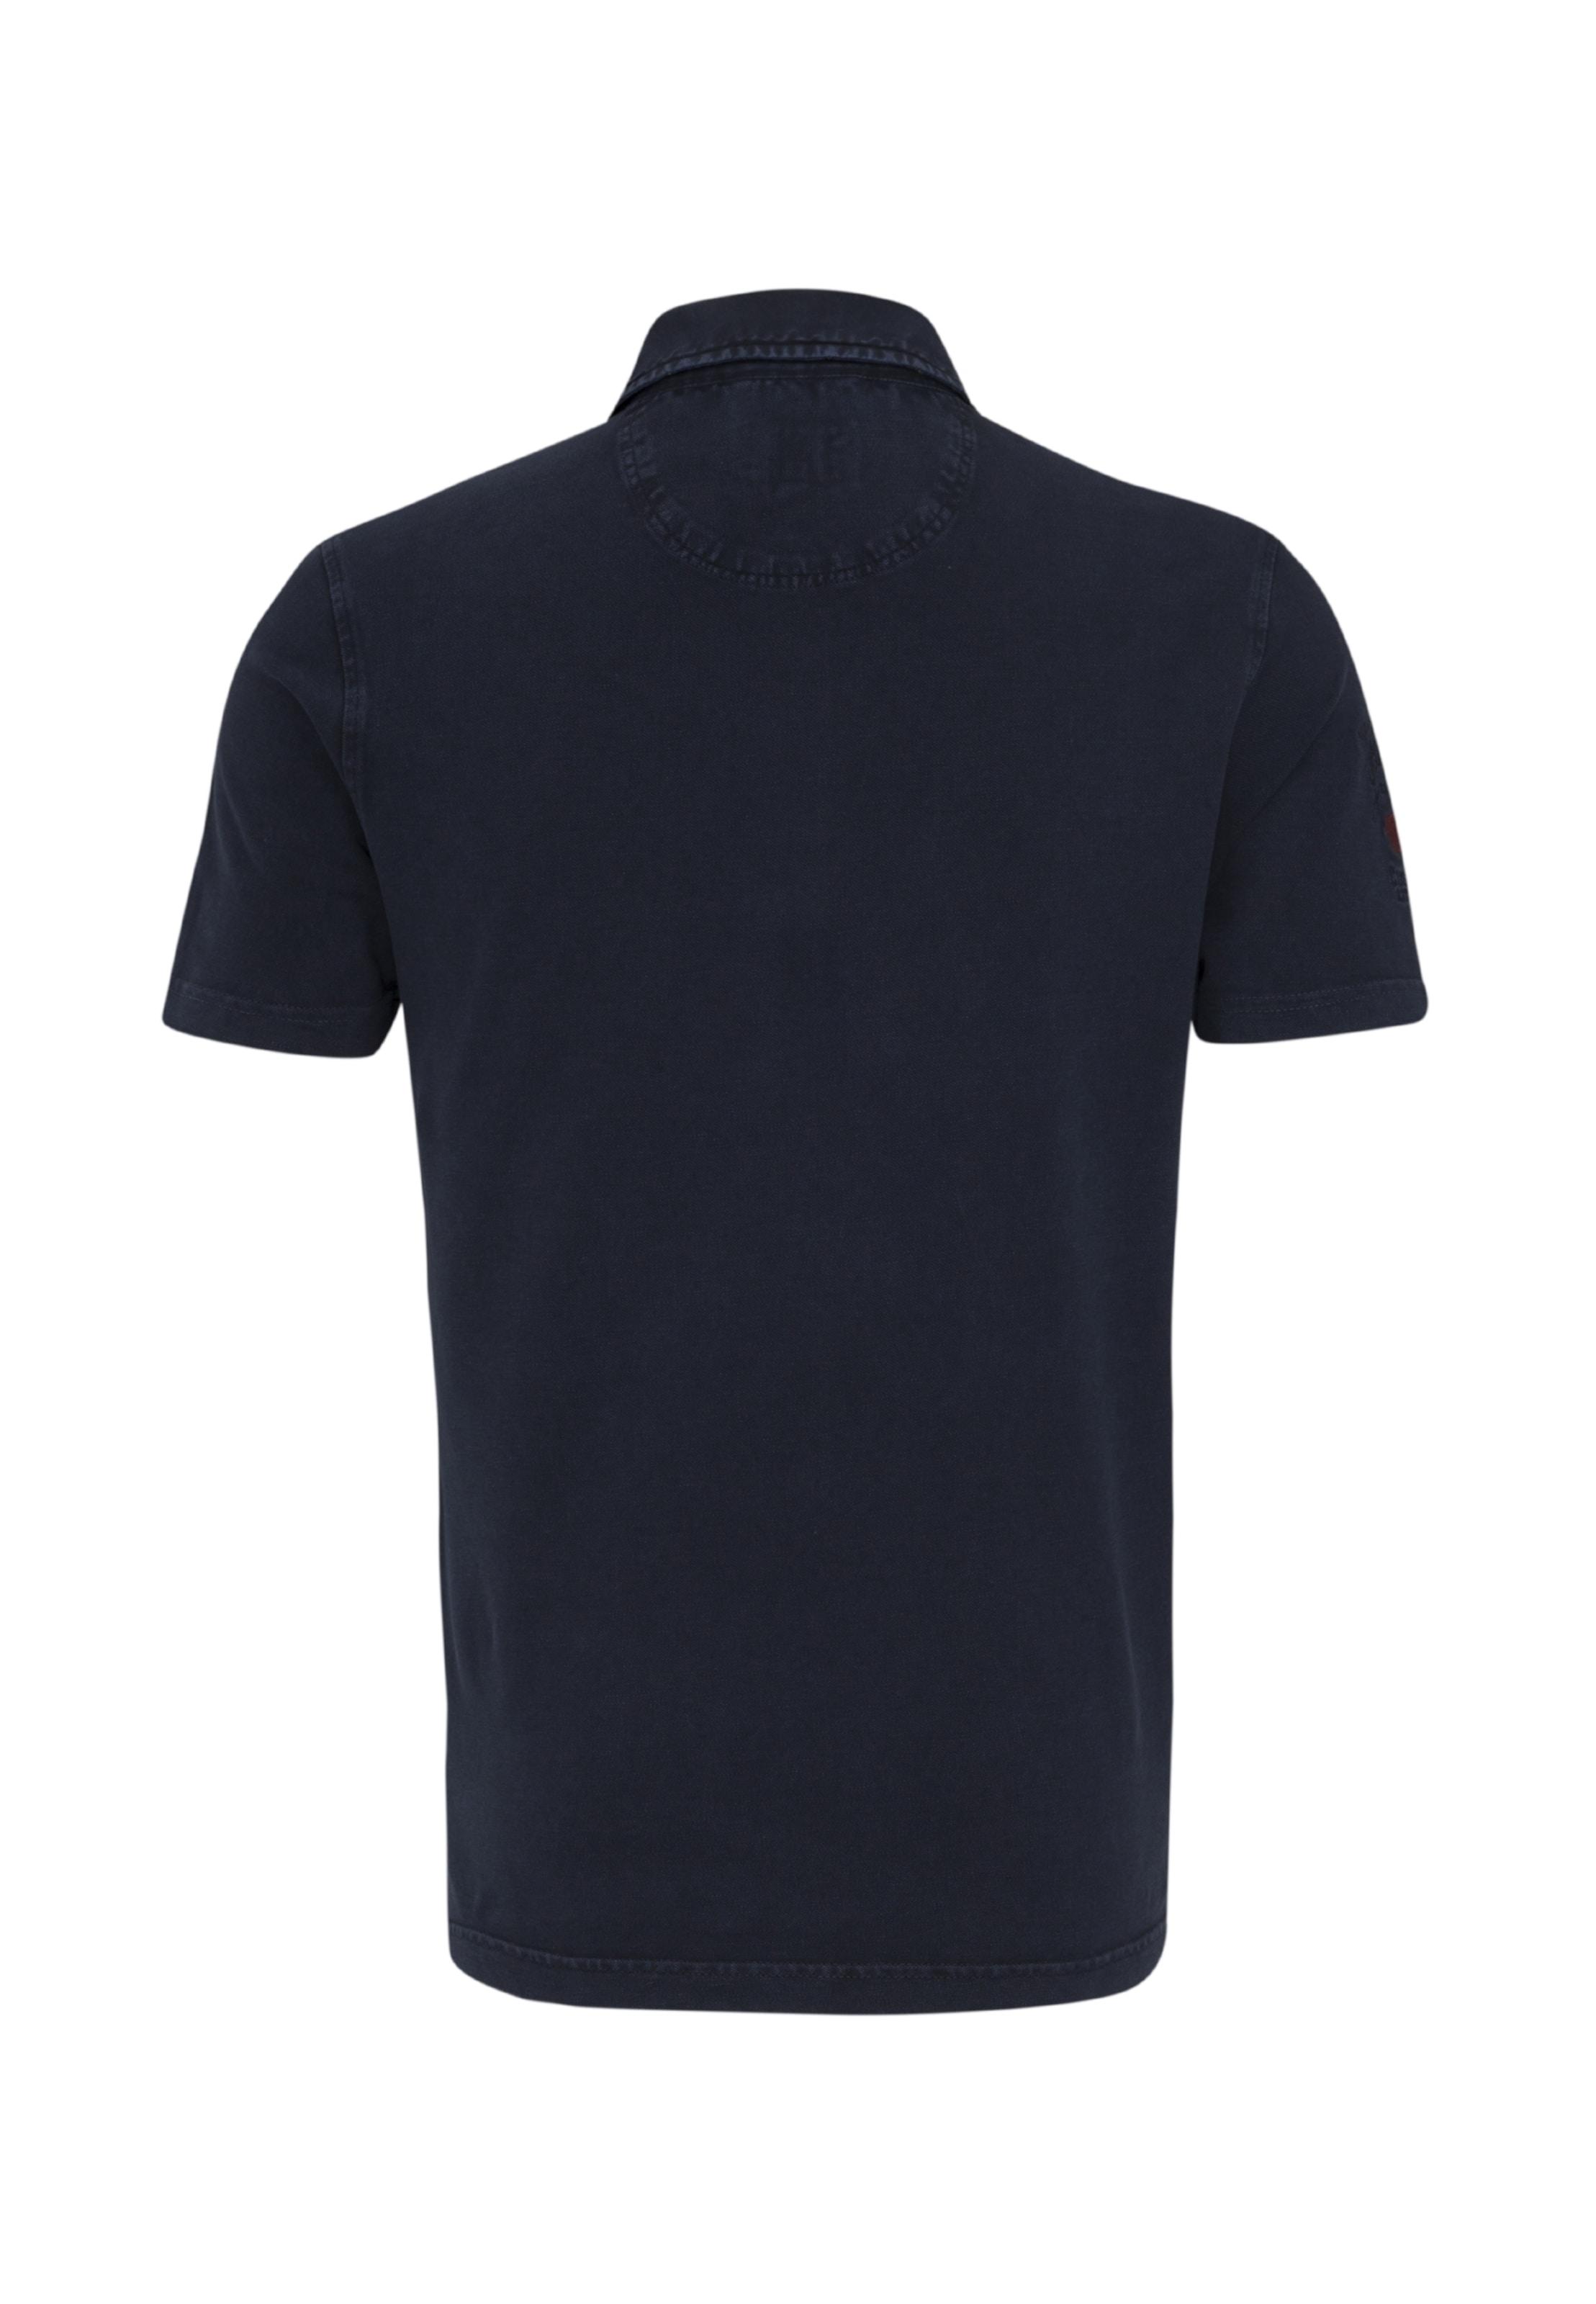 T Bleu Camel Active shirt Marine En rhdtsQC